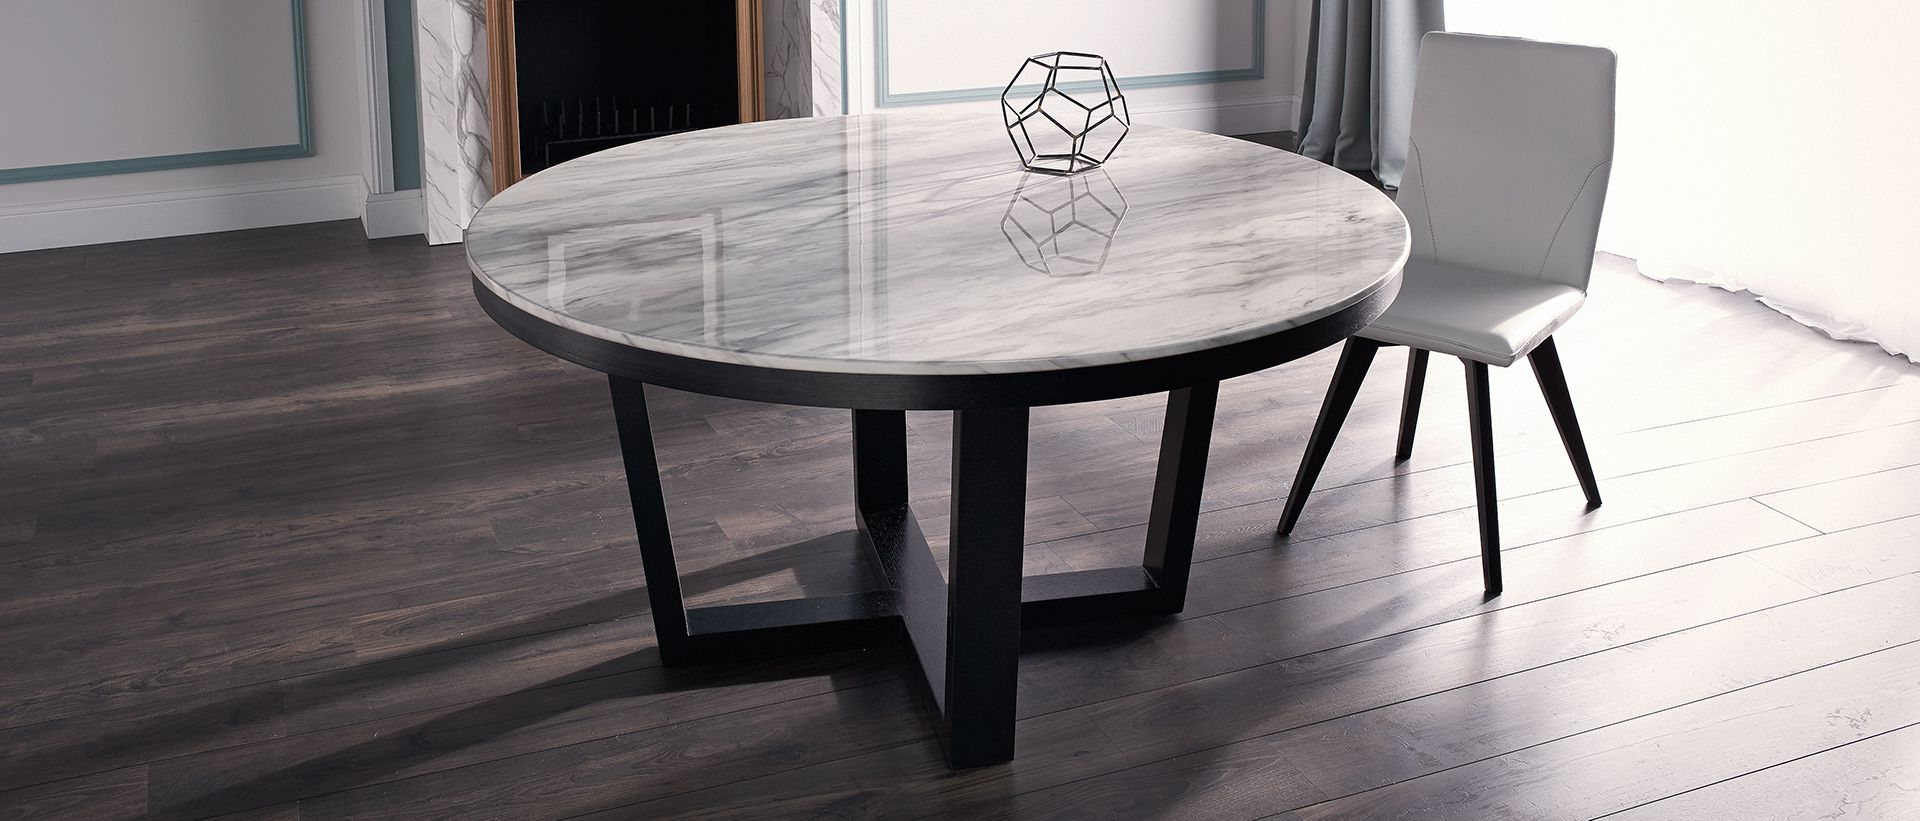 Round, Wood & Concrete Tables